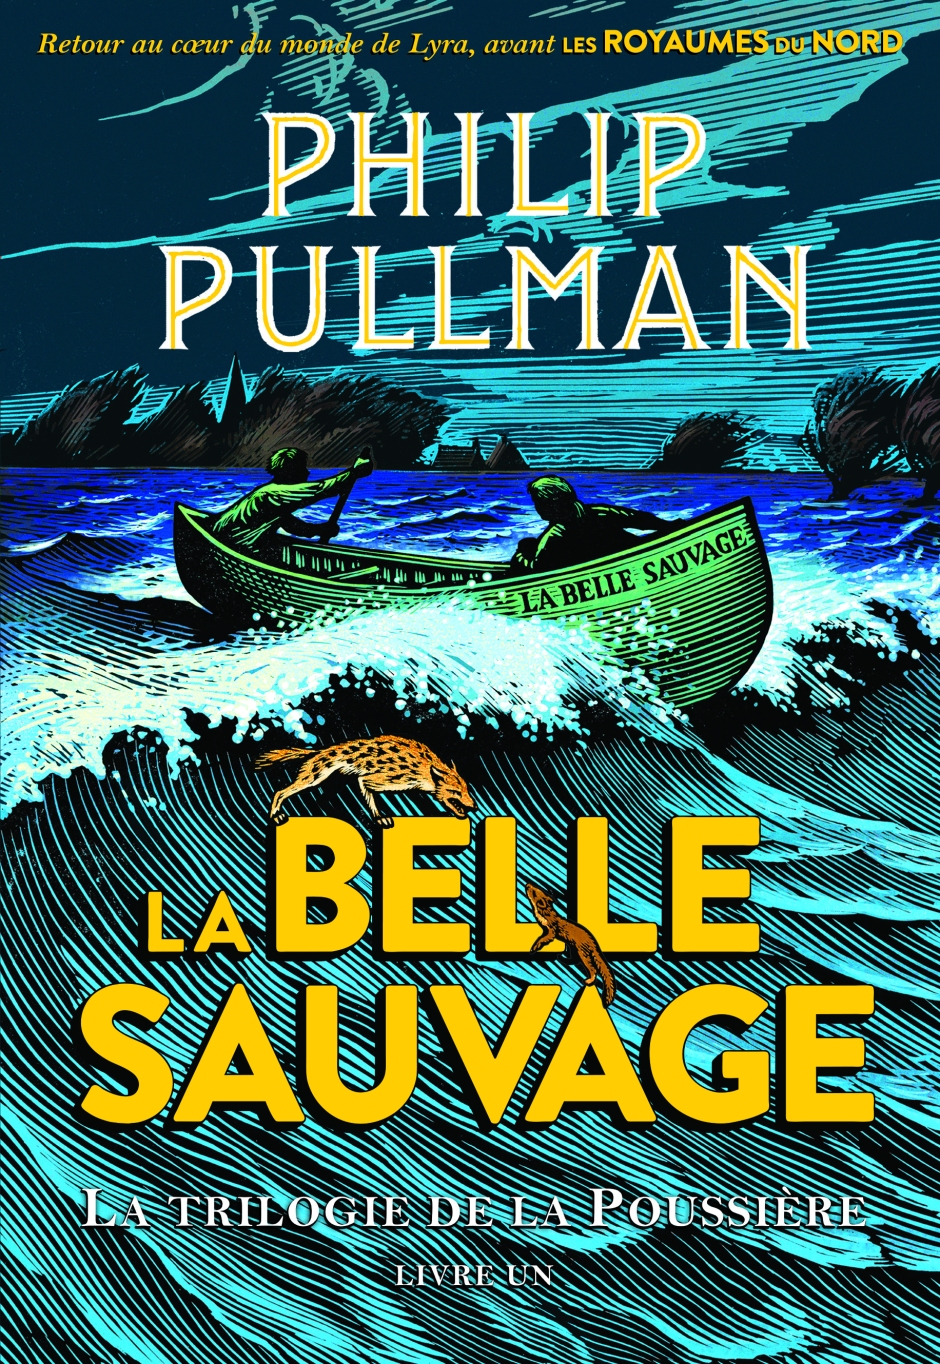 trilogie-poussiere_T1_Belle-Sauvage_J00716.indd